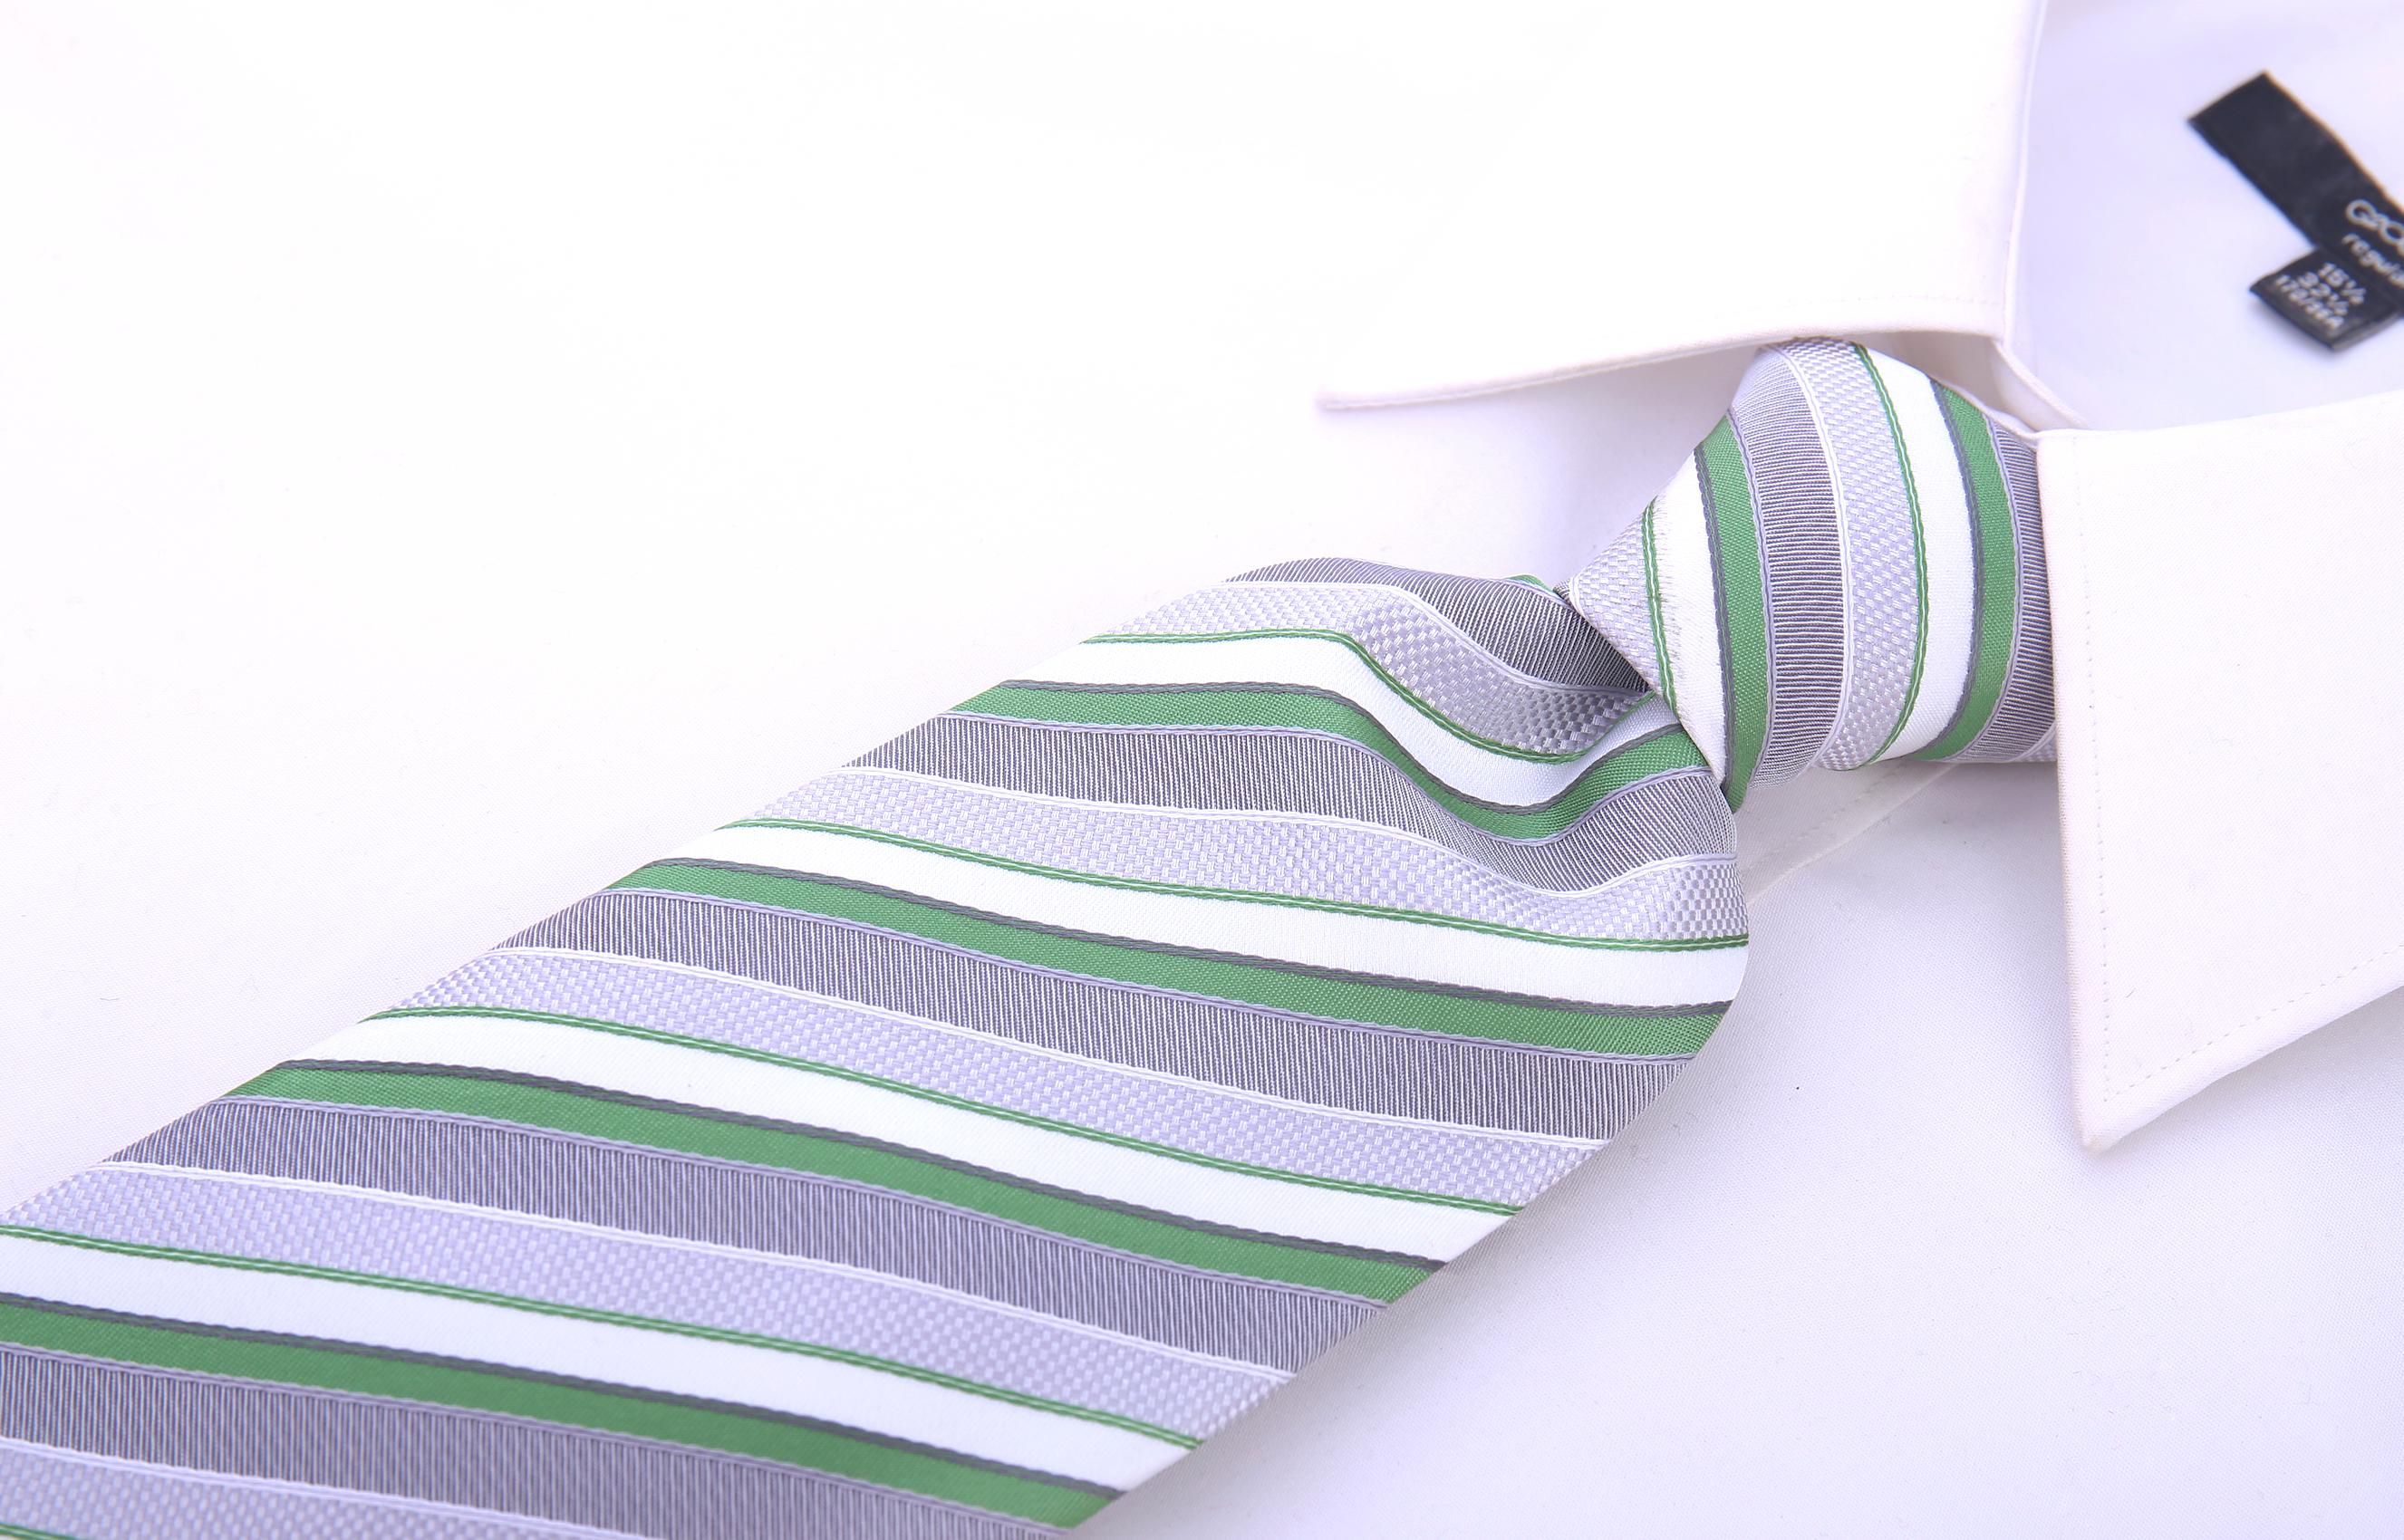 Scott-Allan-Striped-Necktie-Mens-Ties-in-Various-Colors thumbnail 15